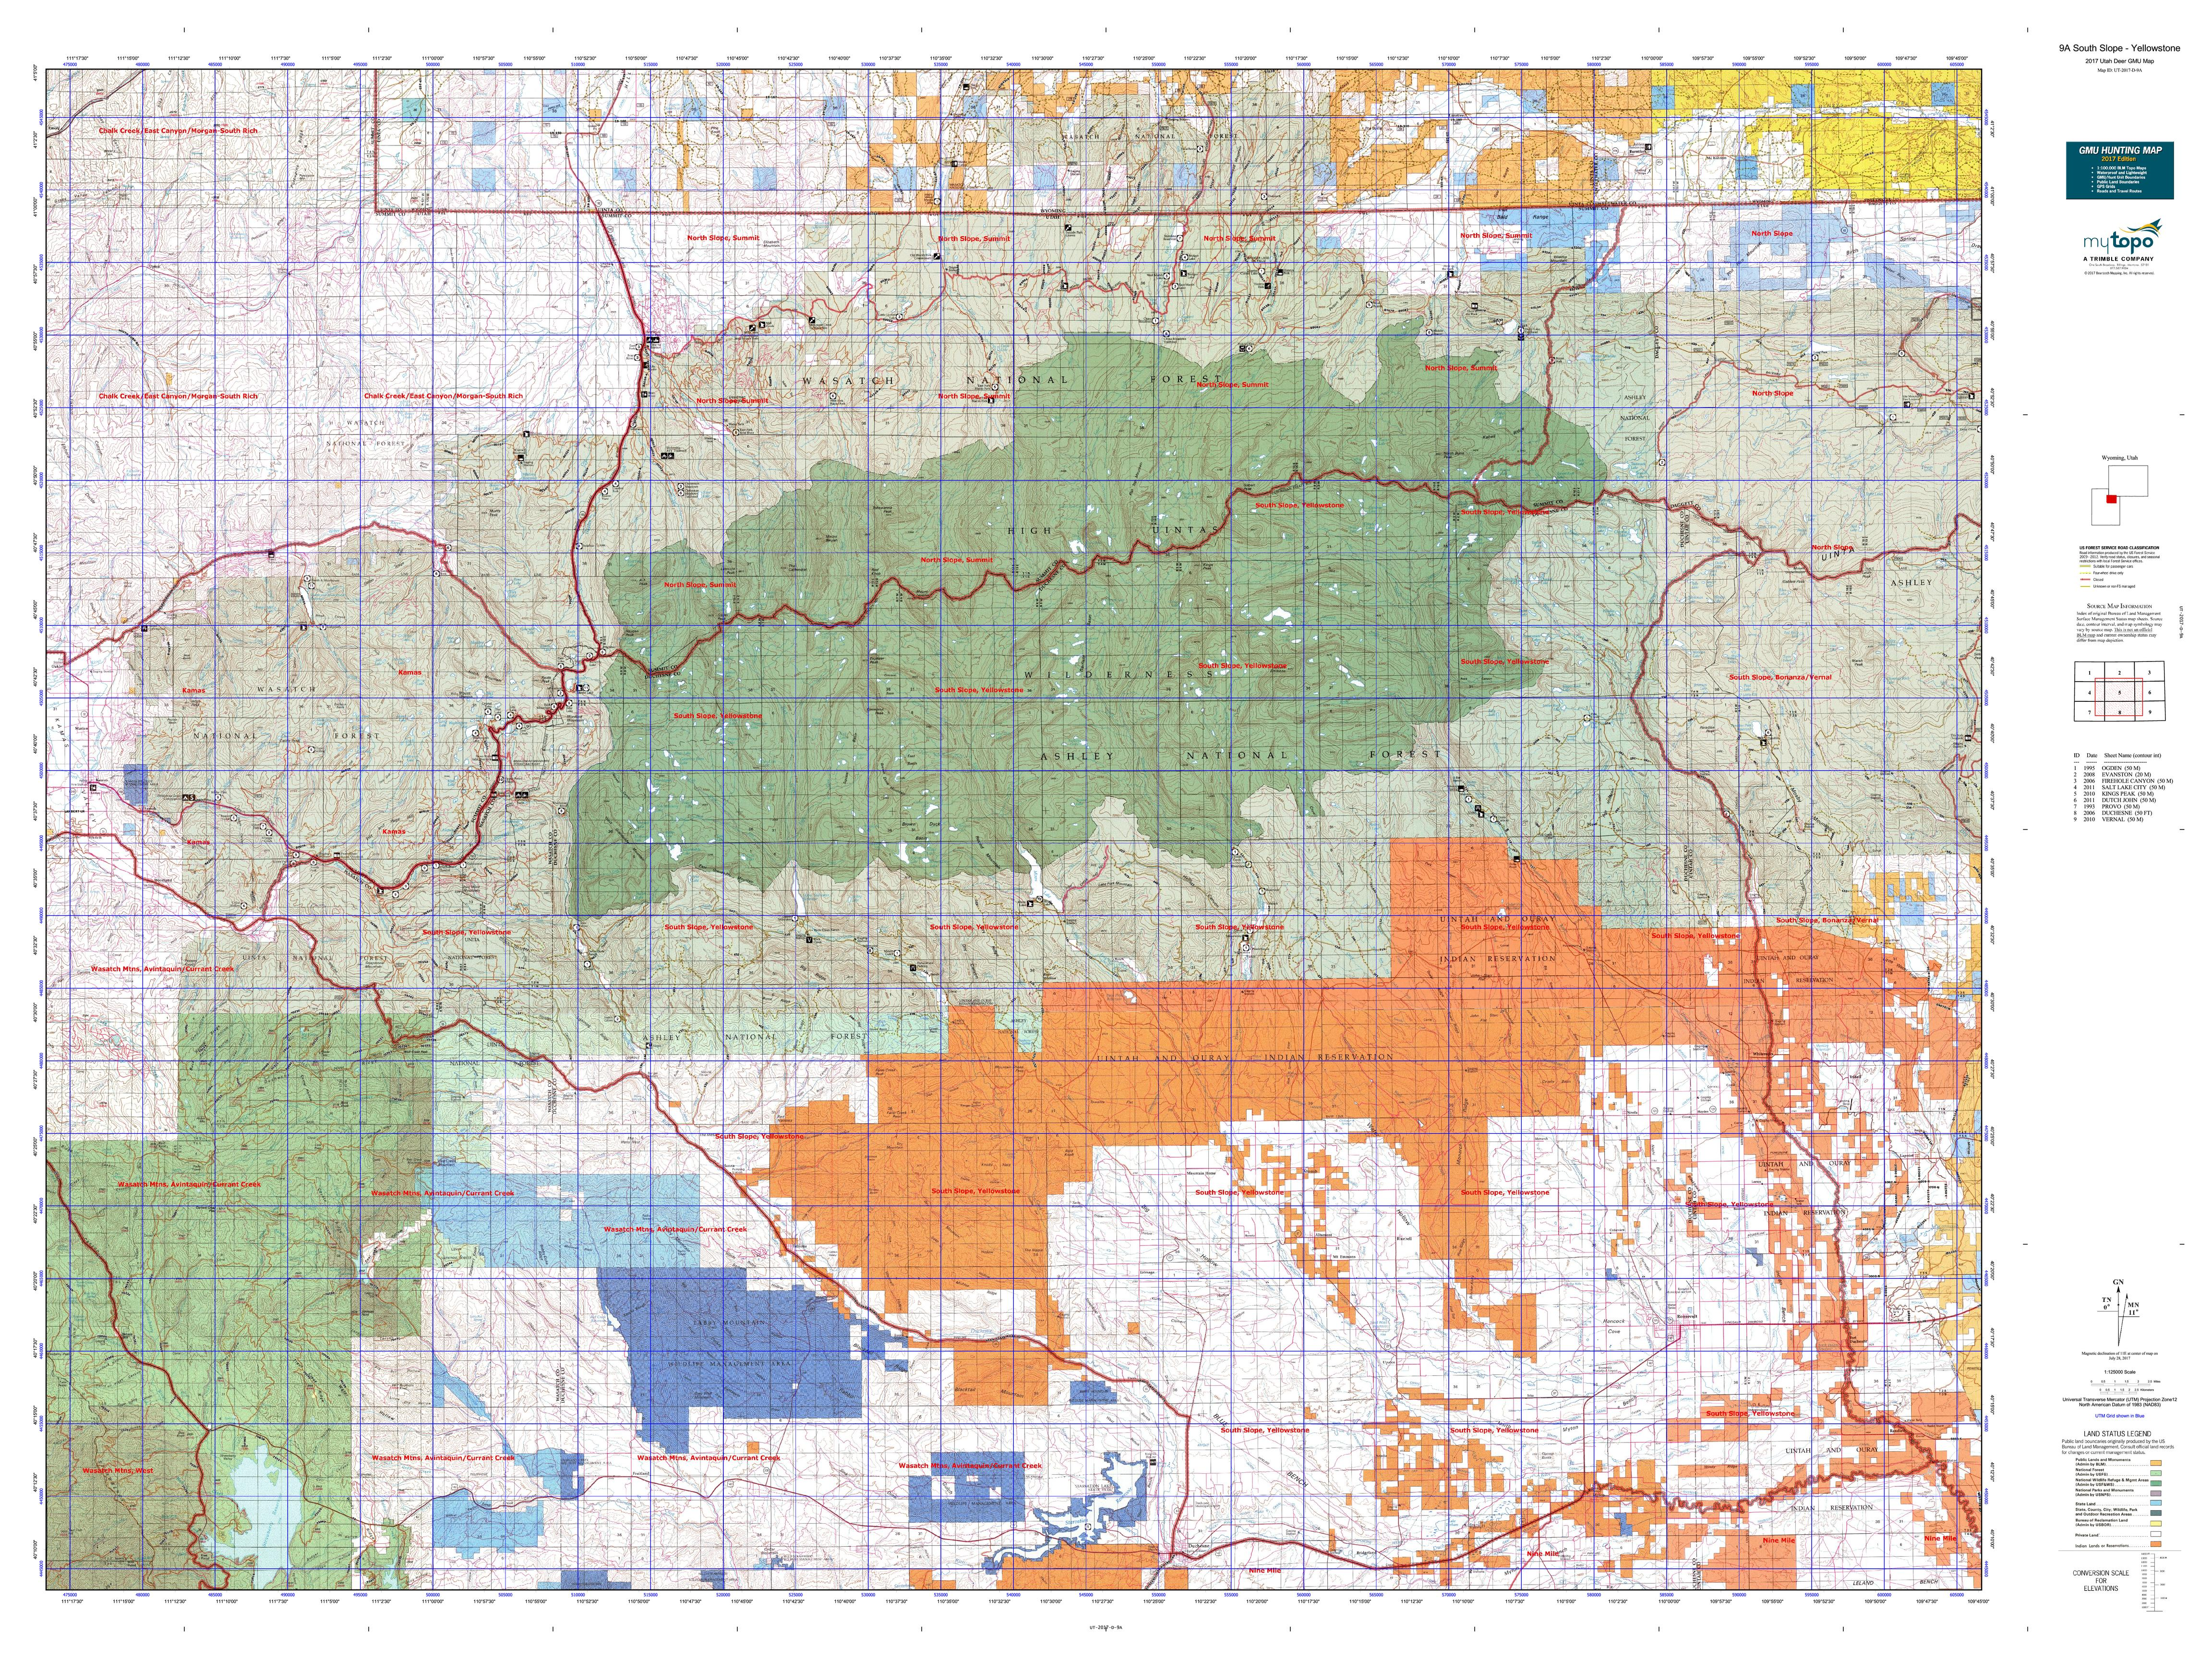 A South Slope Yellowstone Map MyTopo - Yellowstone map